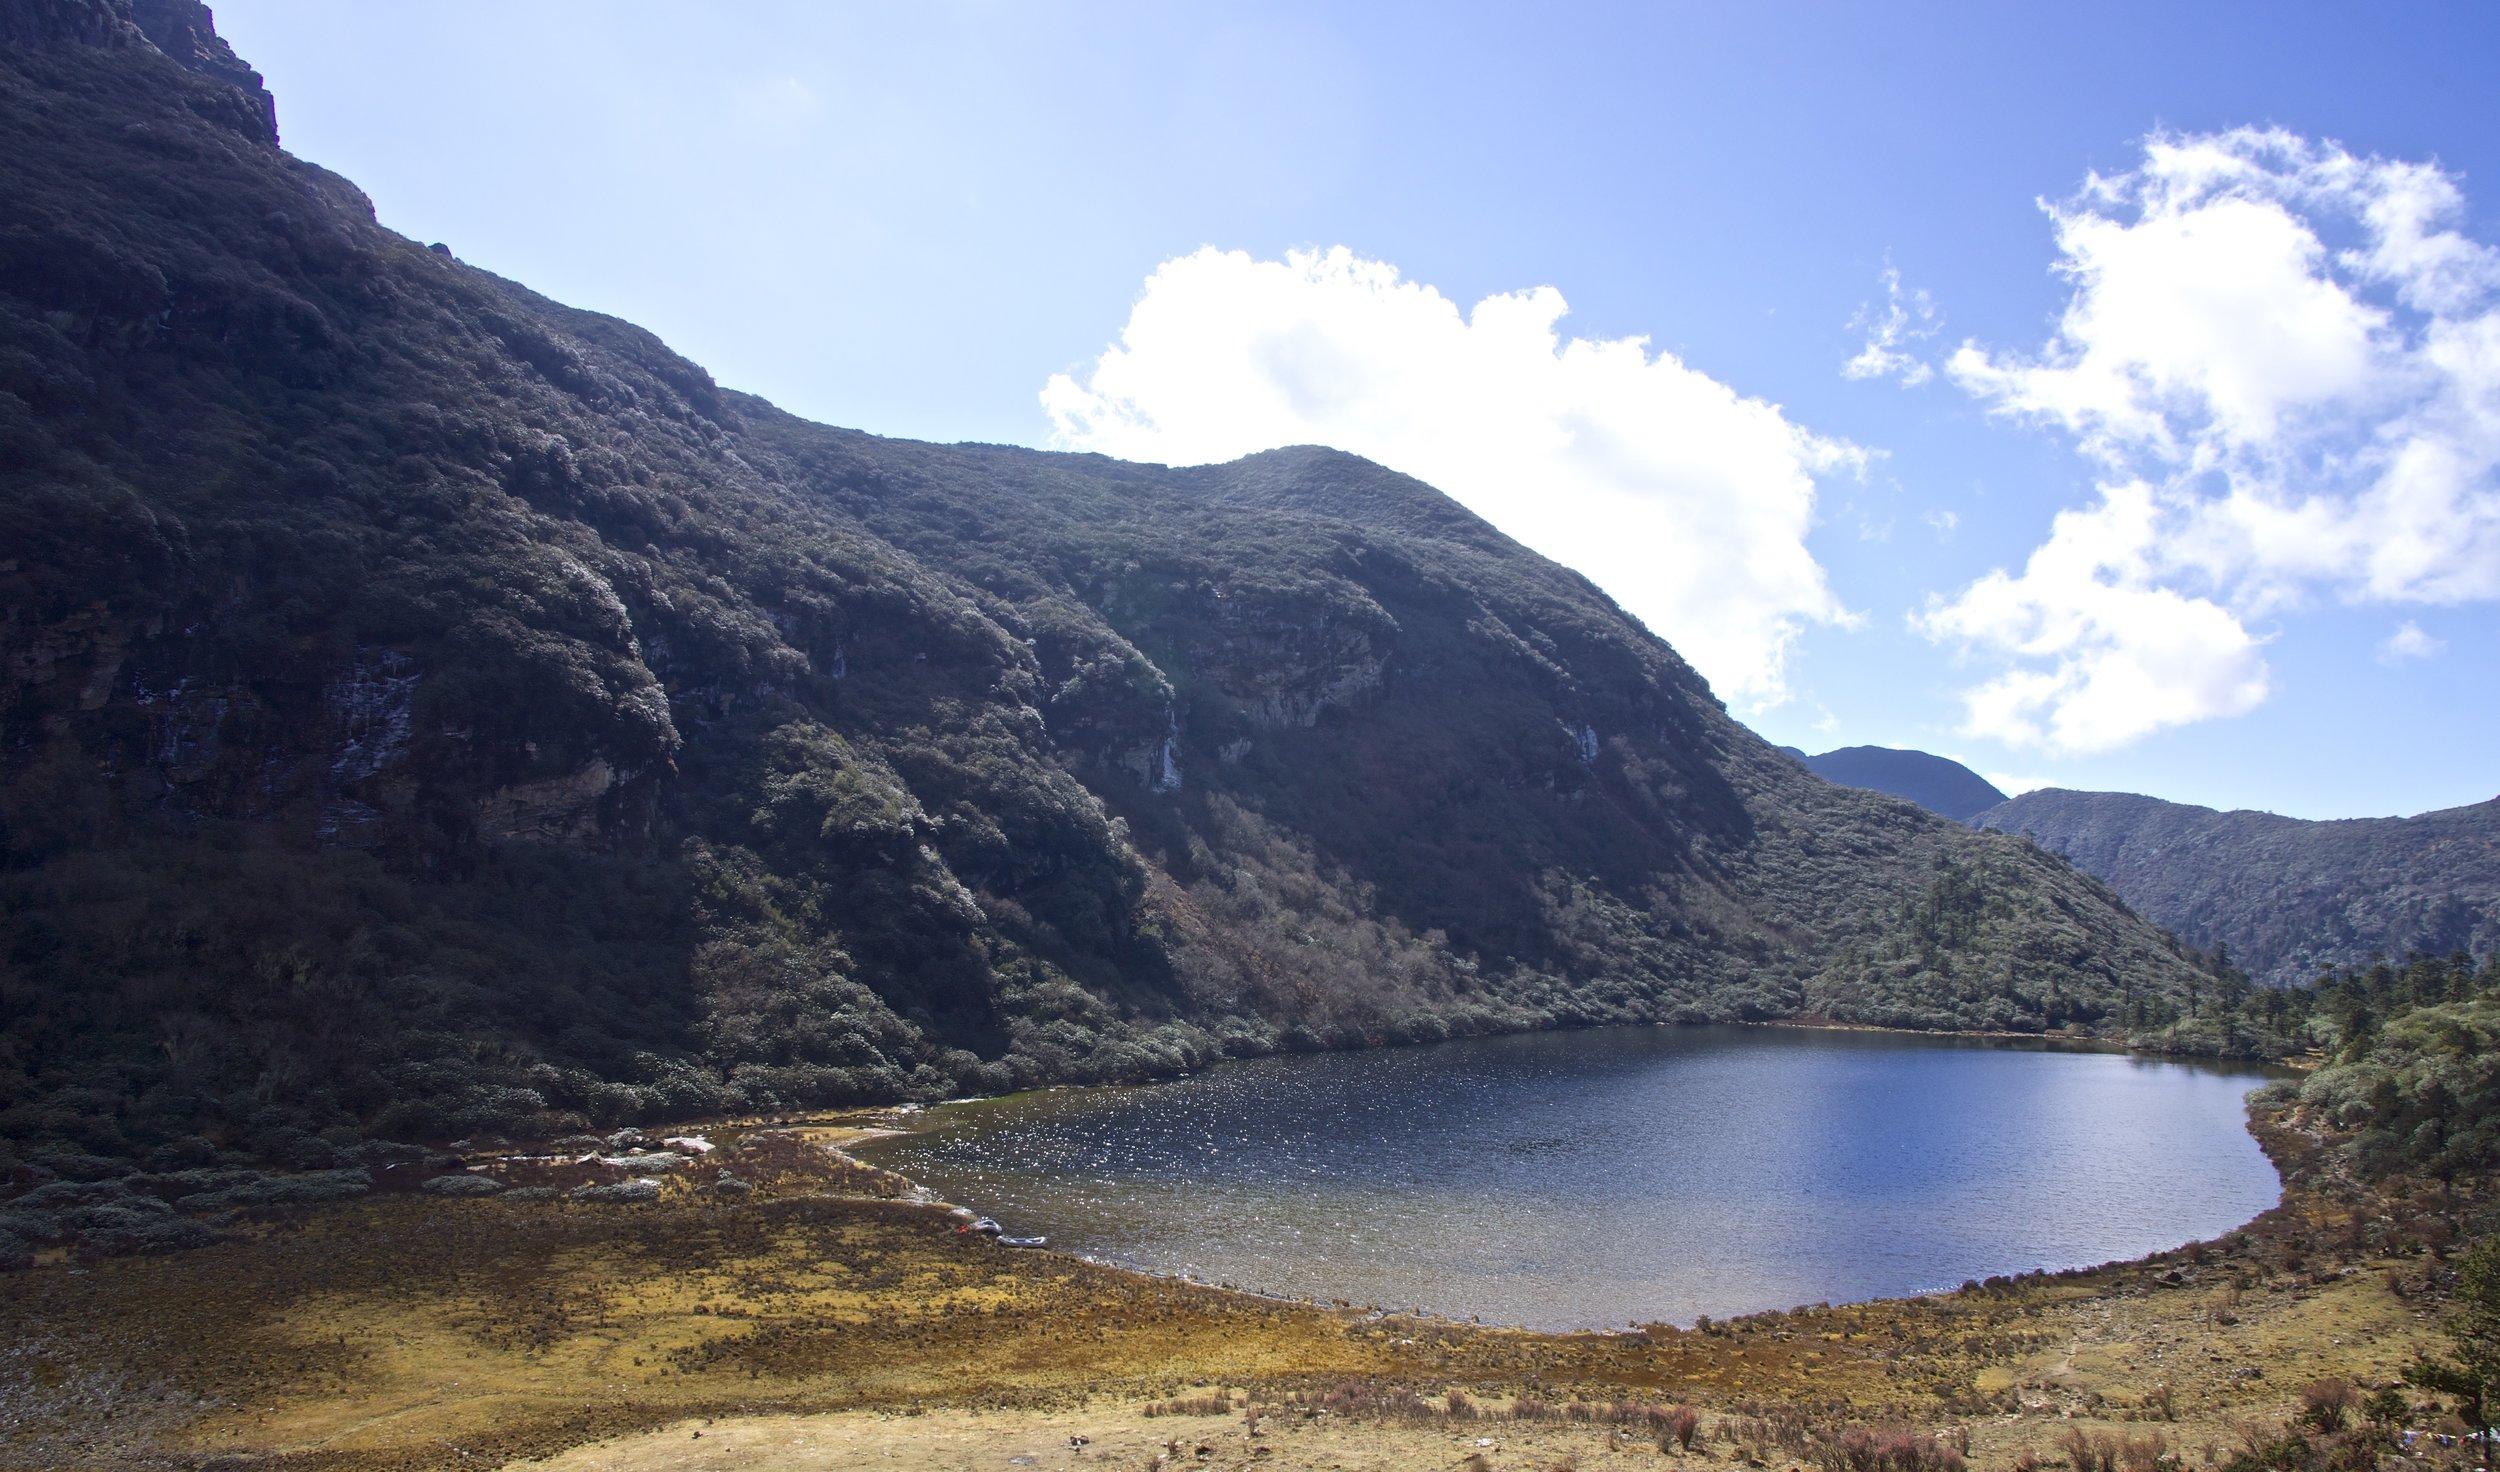 A campsite near a sacred lake.